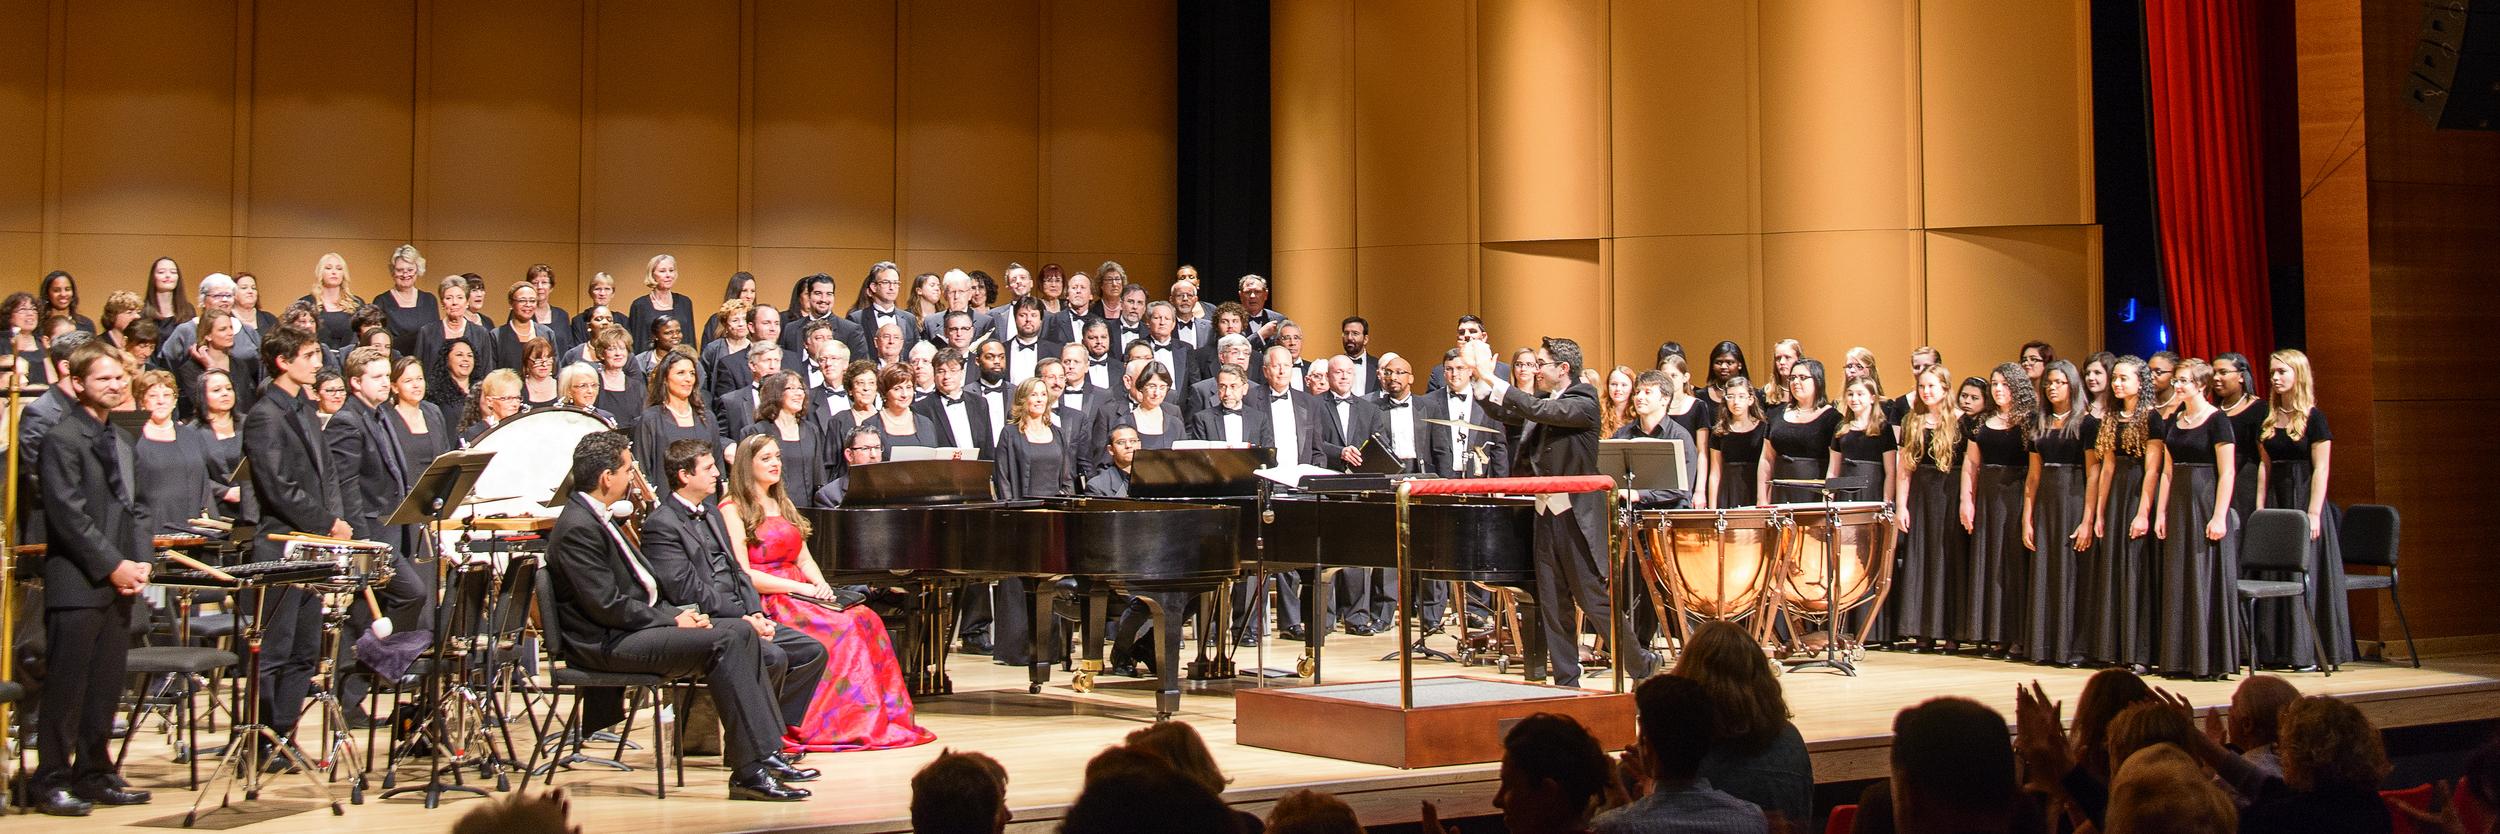 "2015  ""Carmina Burana,""  Master Chorale of South Florida at the  Wold Performing Arts Center, Lynn University, Boca Raton, Florida"